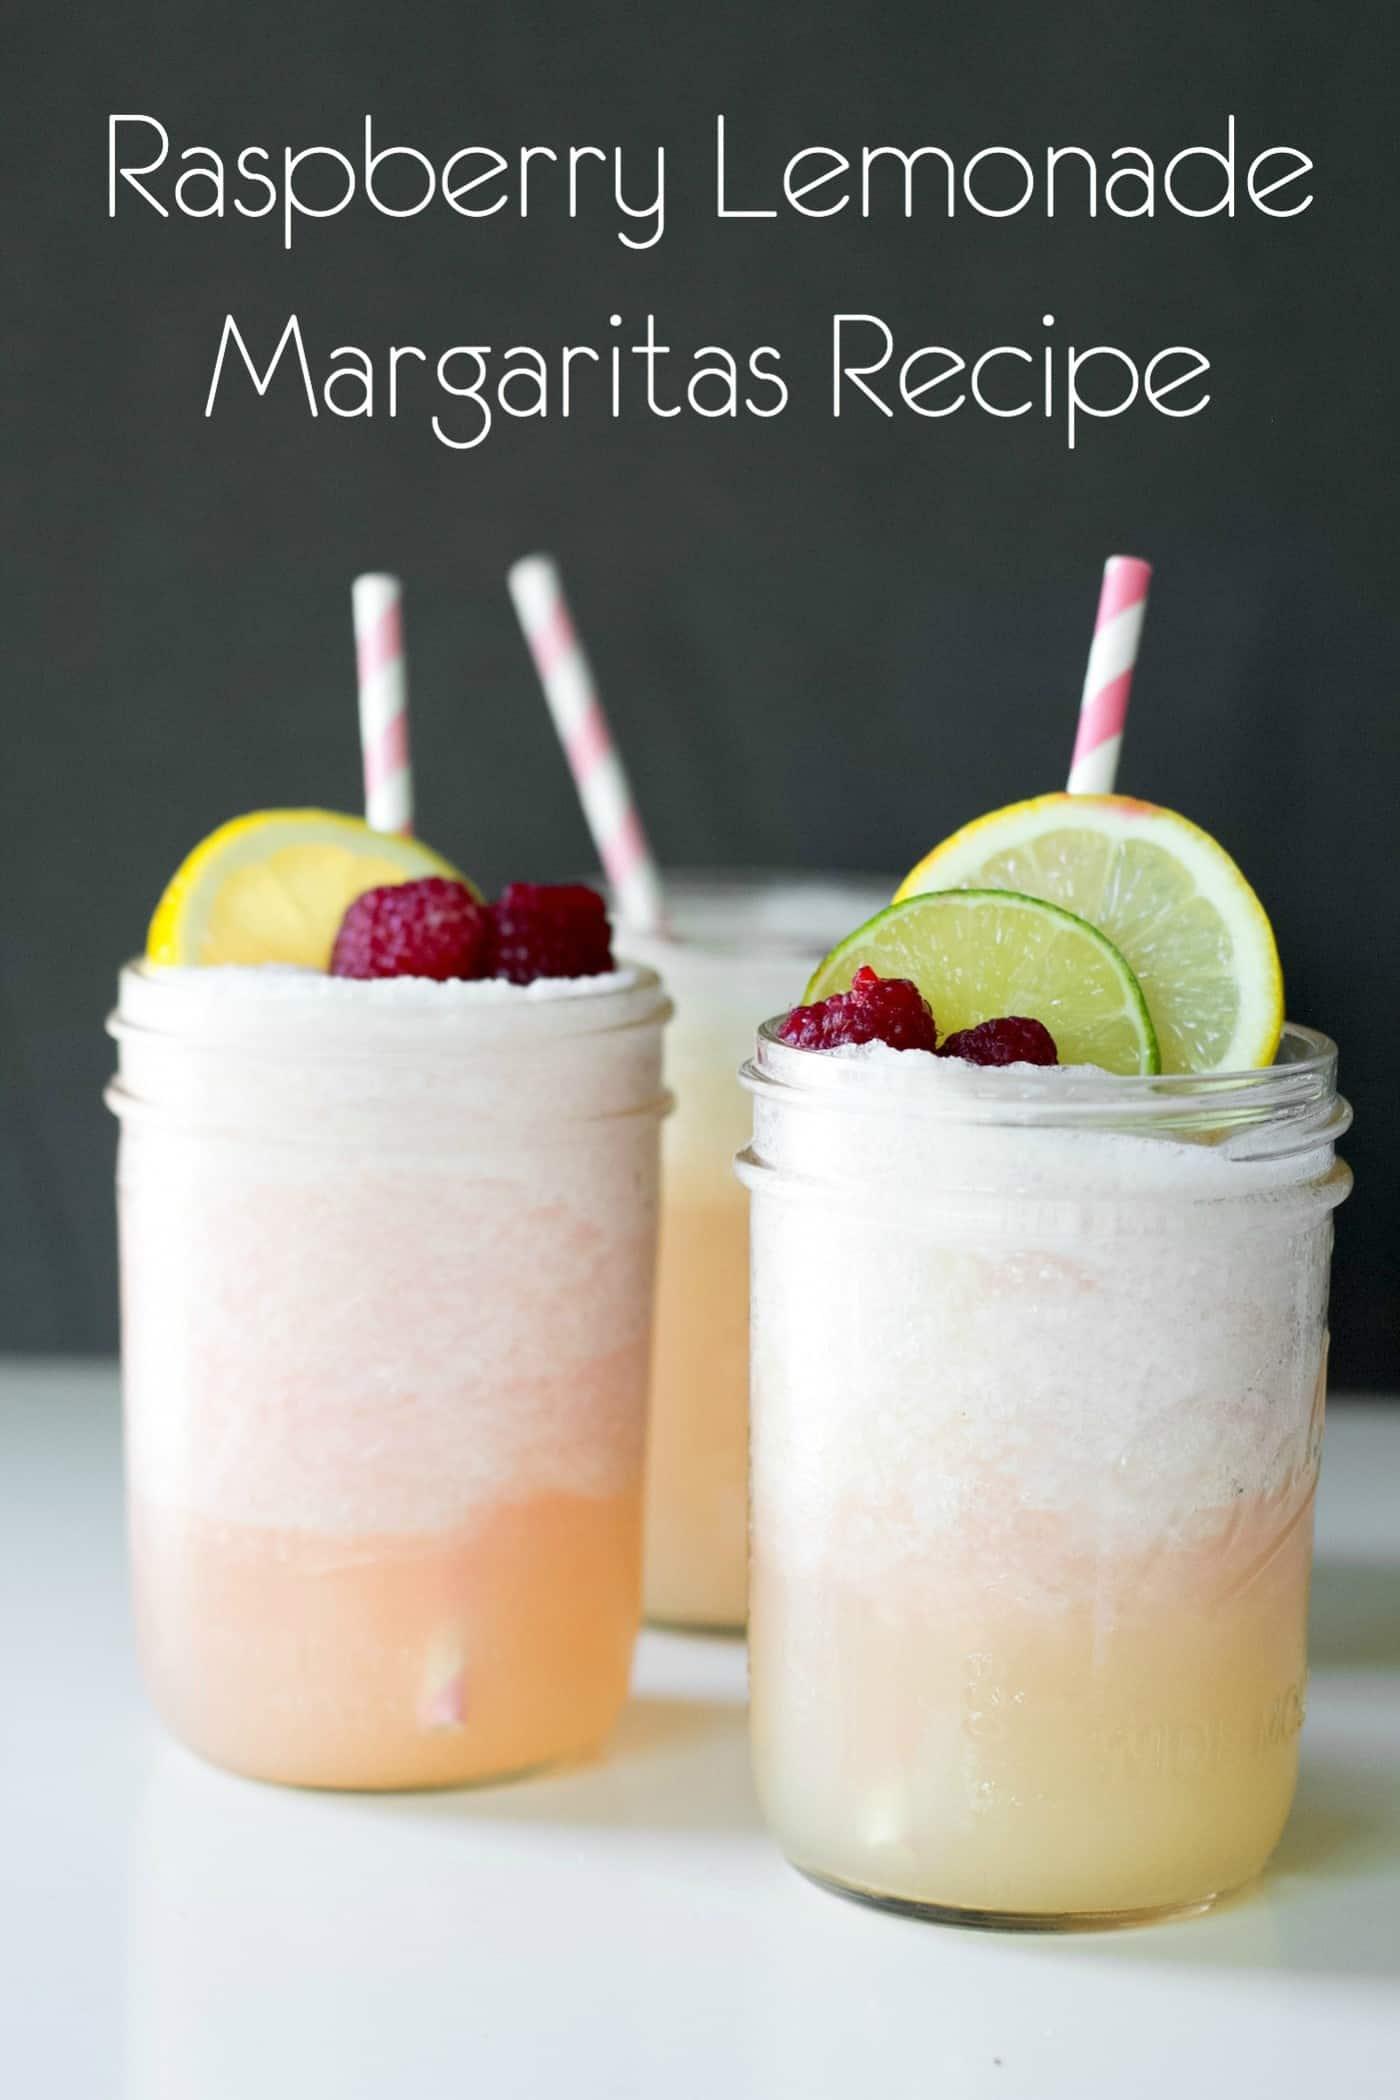 Raspberry Lemonade Margarita Recipe